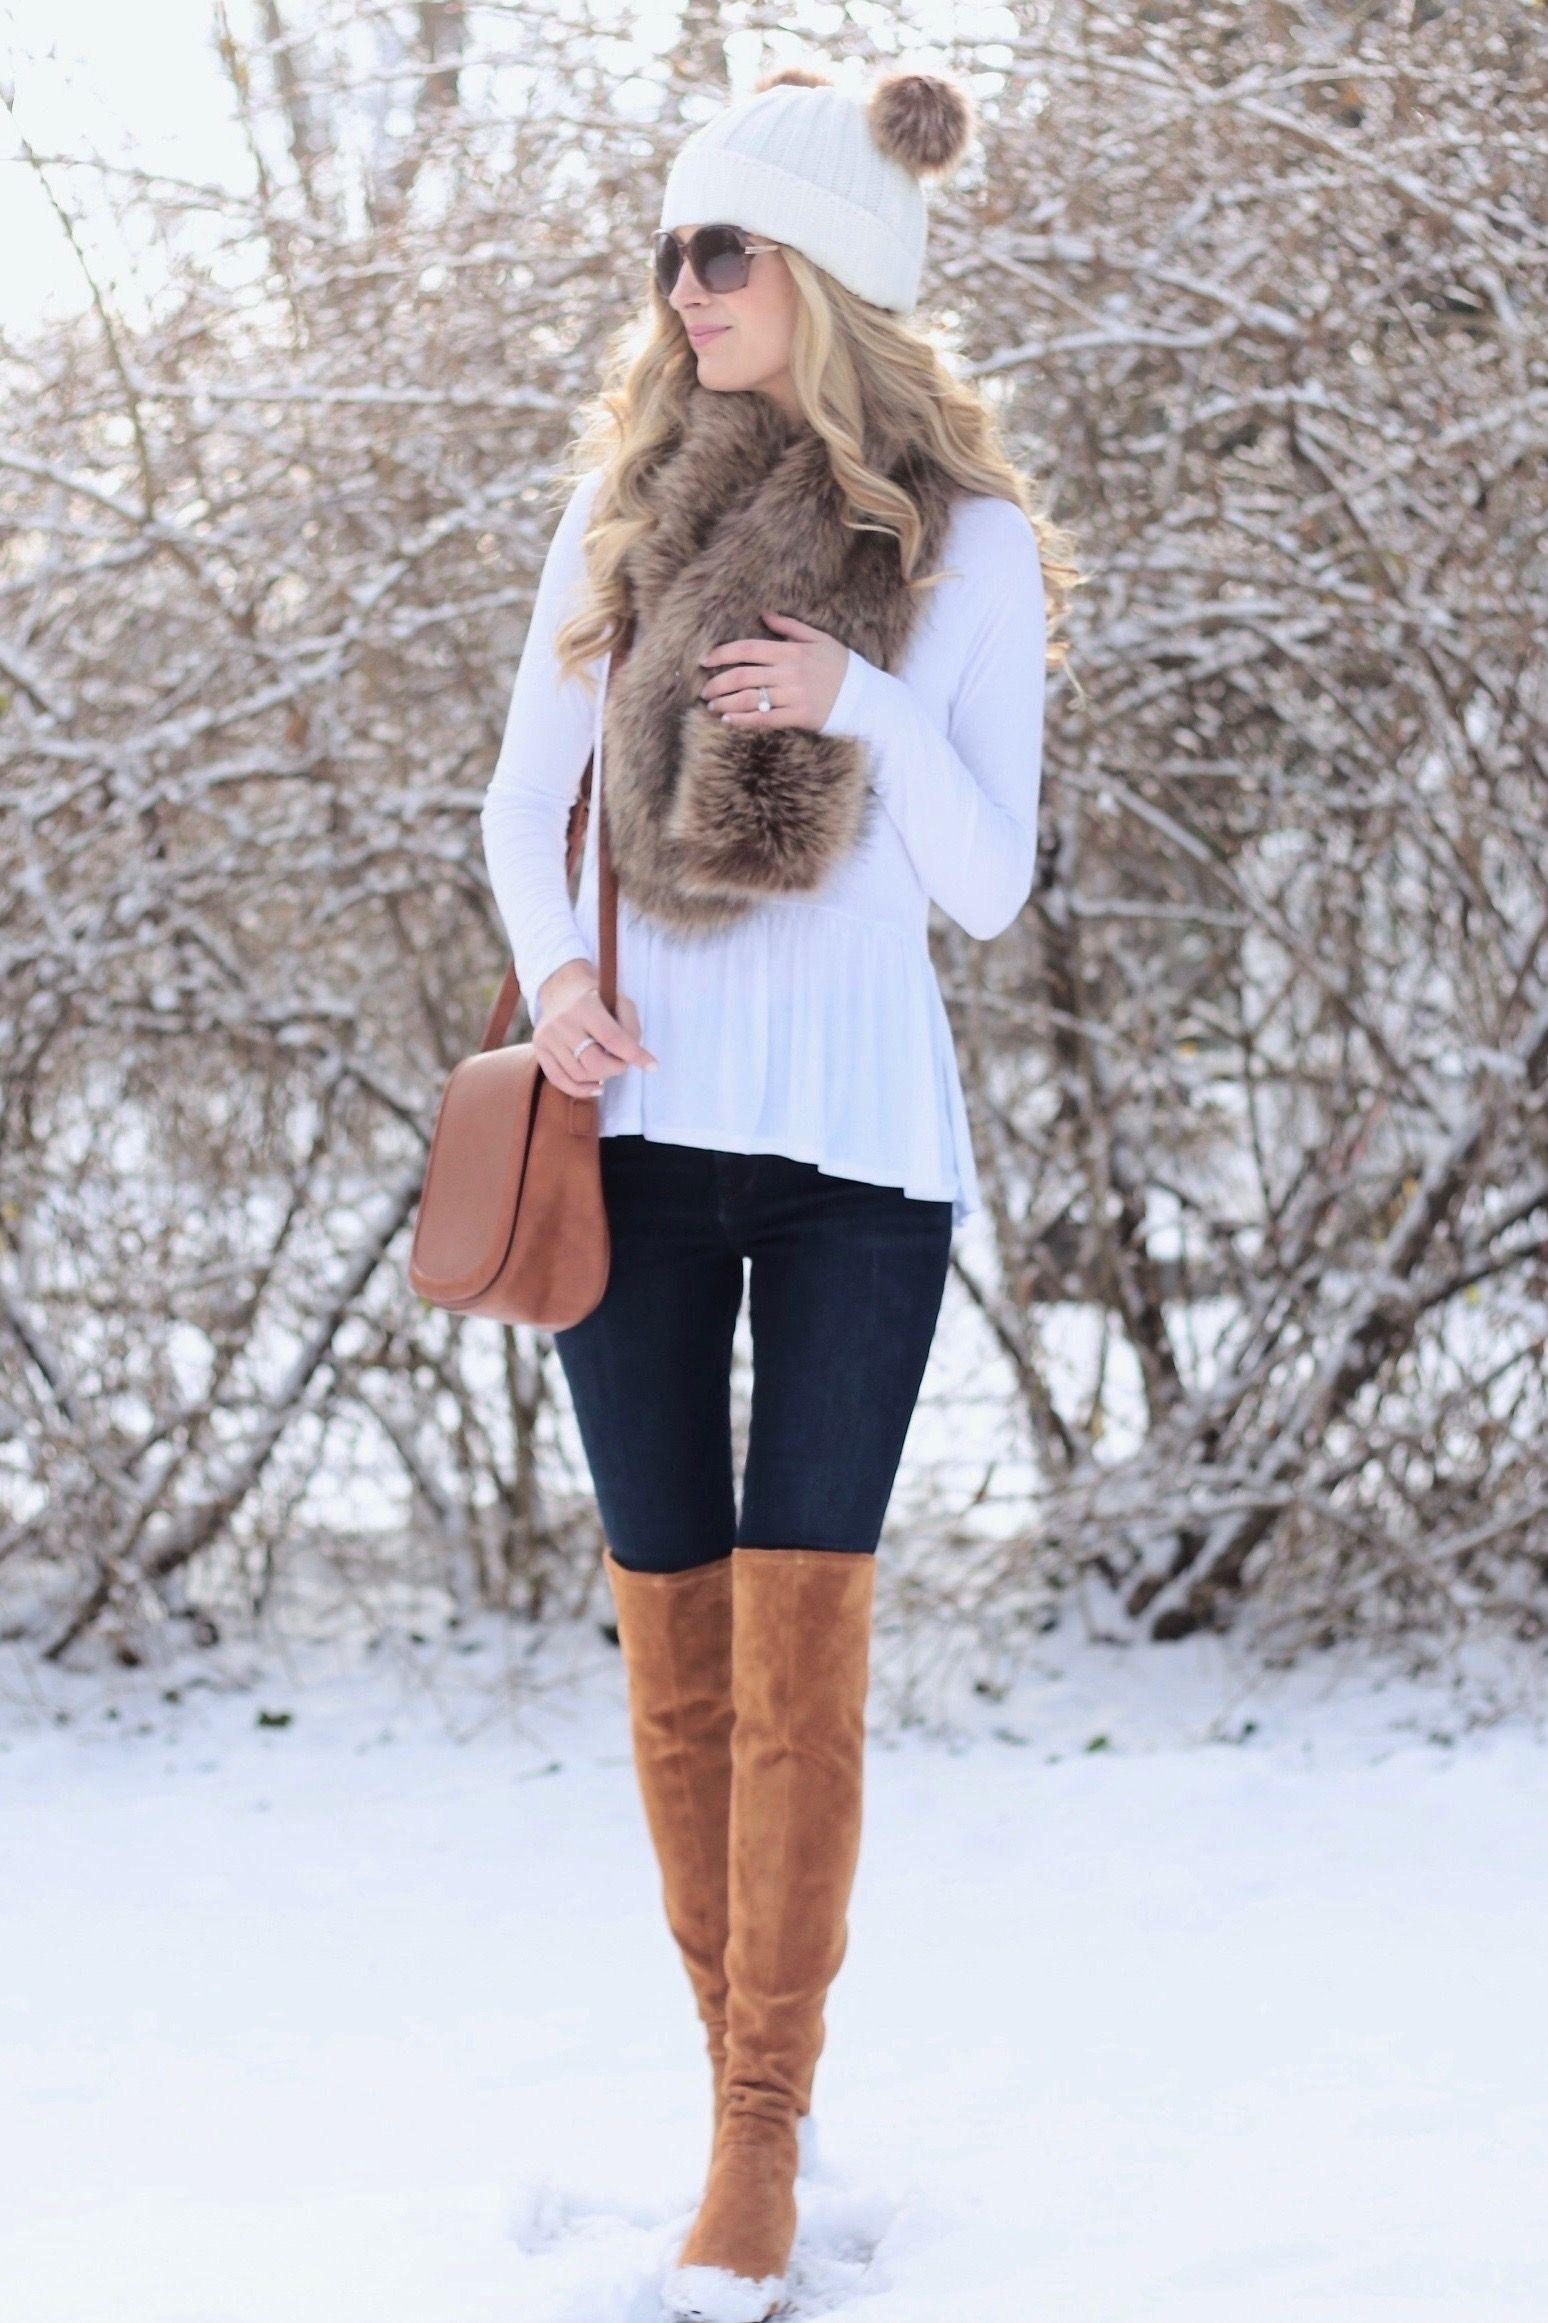 Winter Fashion Trends For The Casual Fashionista